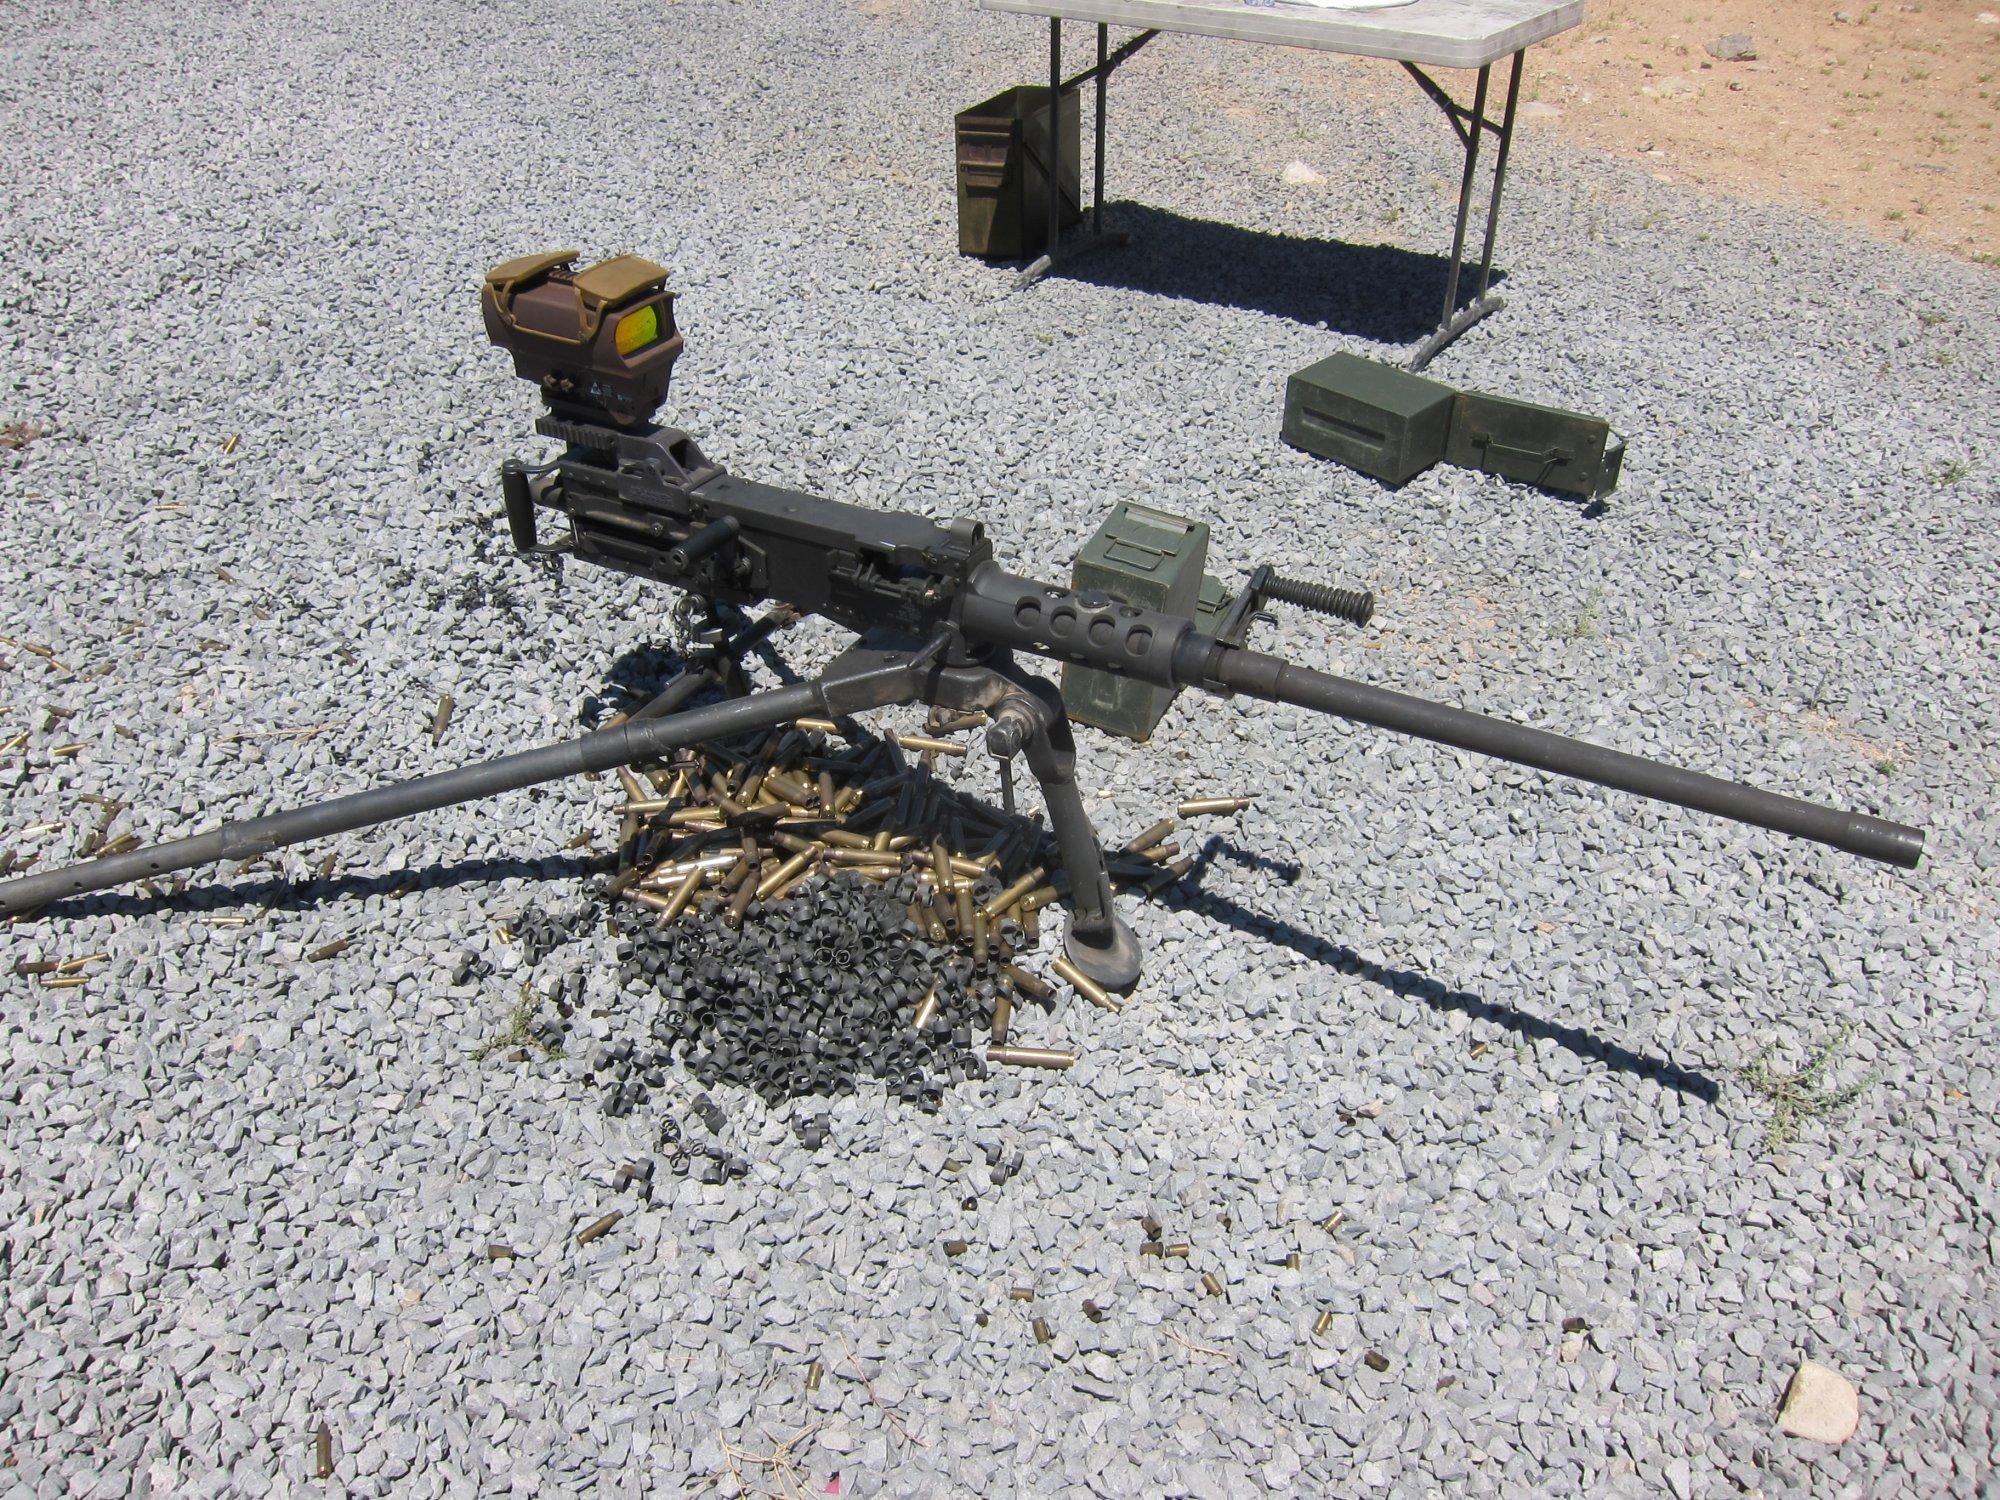 "<!--:en-->U.S. Ordnance M2HB-QCB (Quick-Change Barrel) ""Ma Deuce"" .50 BMG Heavy Machine Gun (HMG) Equipped with Raytheon ELCAN SpecterHR Wide-View Dual Red Dot Optical Gunsight Gets Test-Fired at the Range (Video!)<!--:-->"